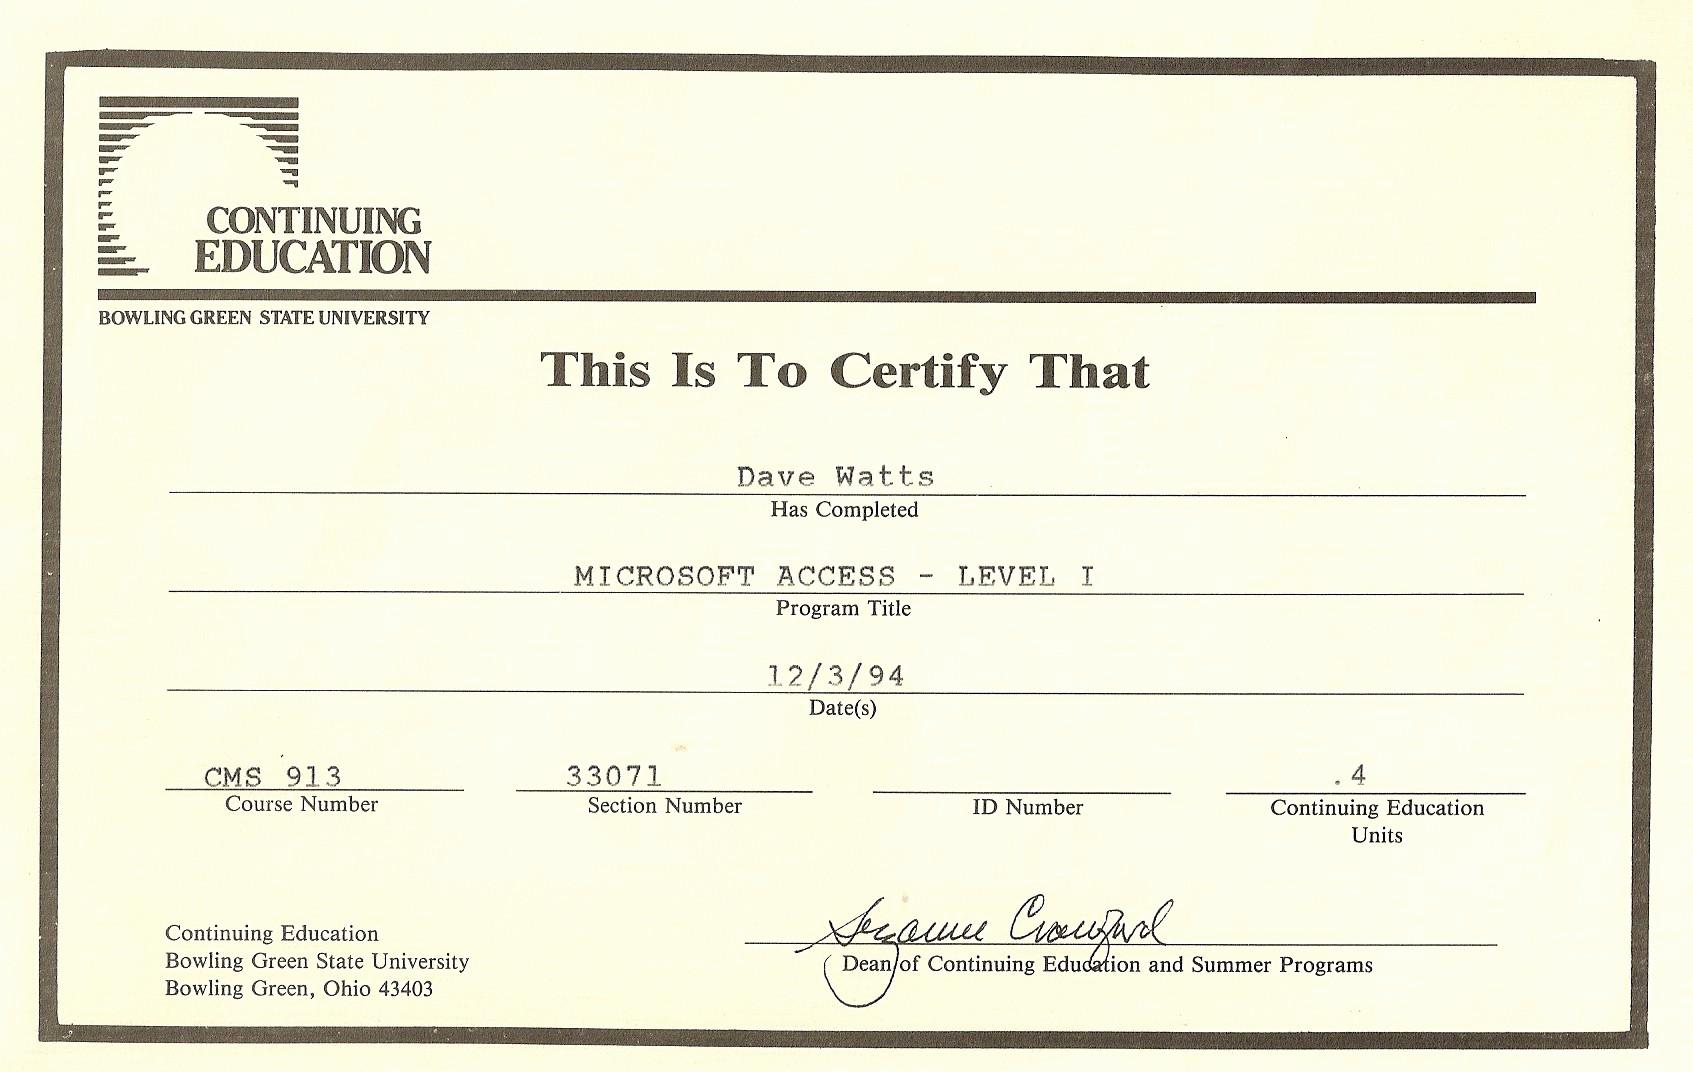 Continuing Education Certificate Template Free New Nursing Ceu Certificate Template